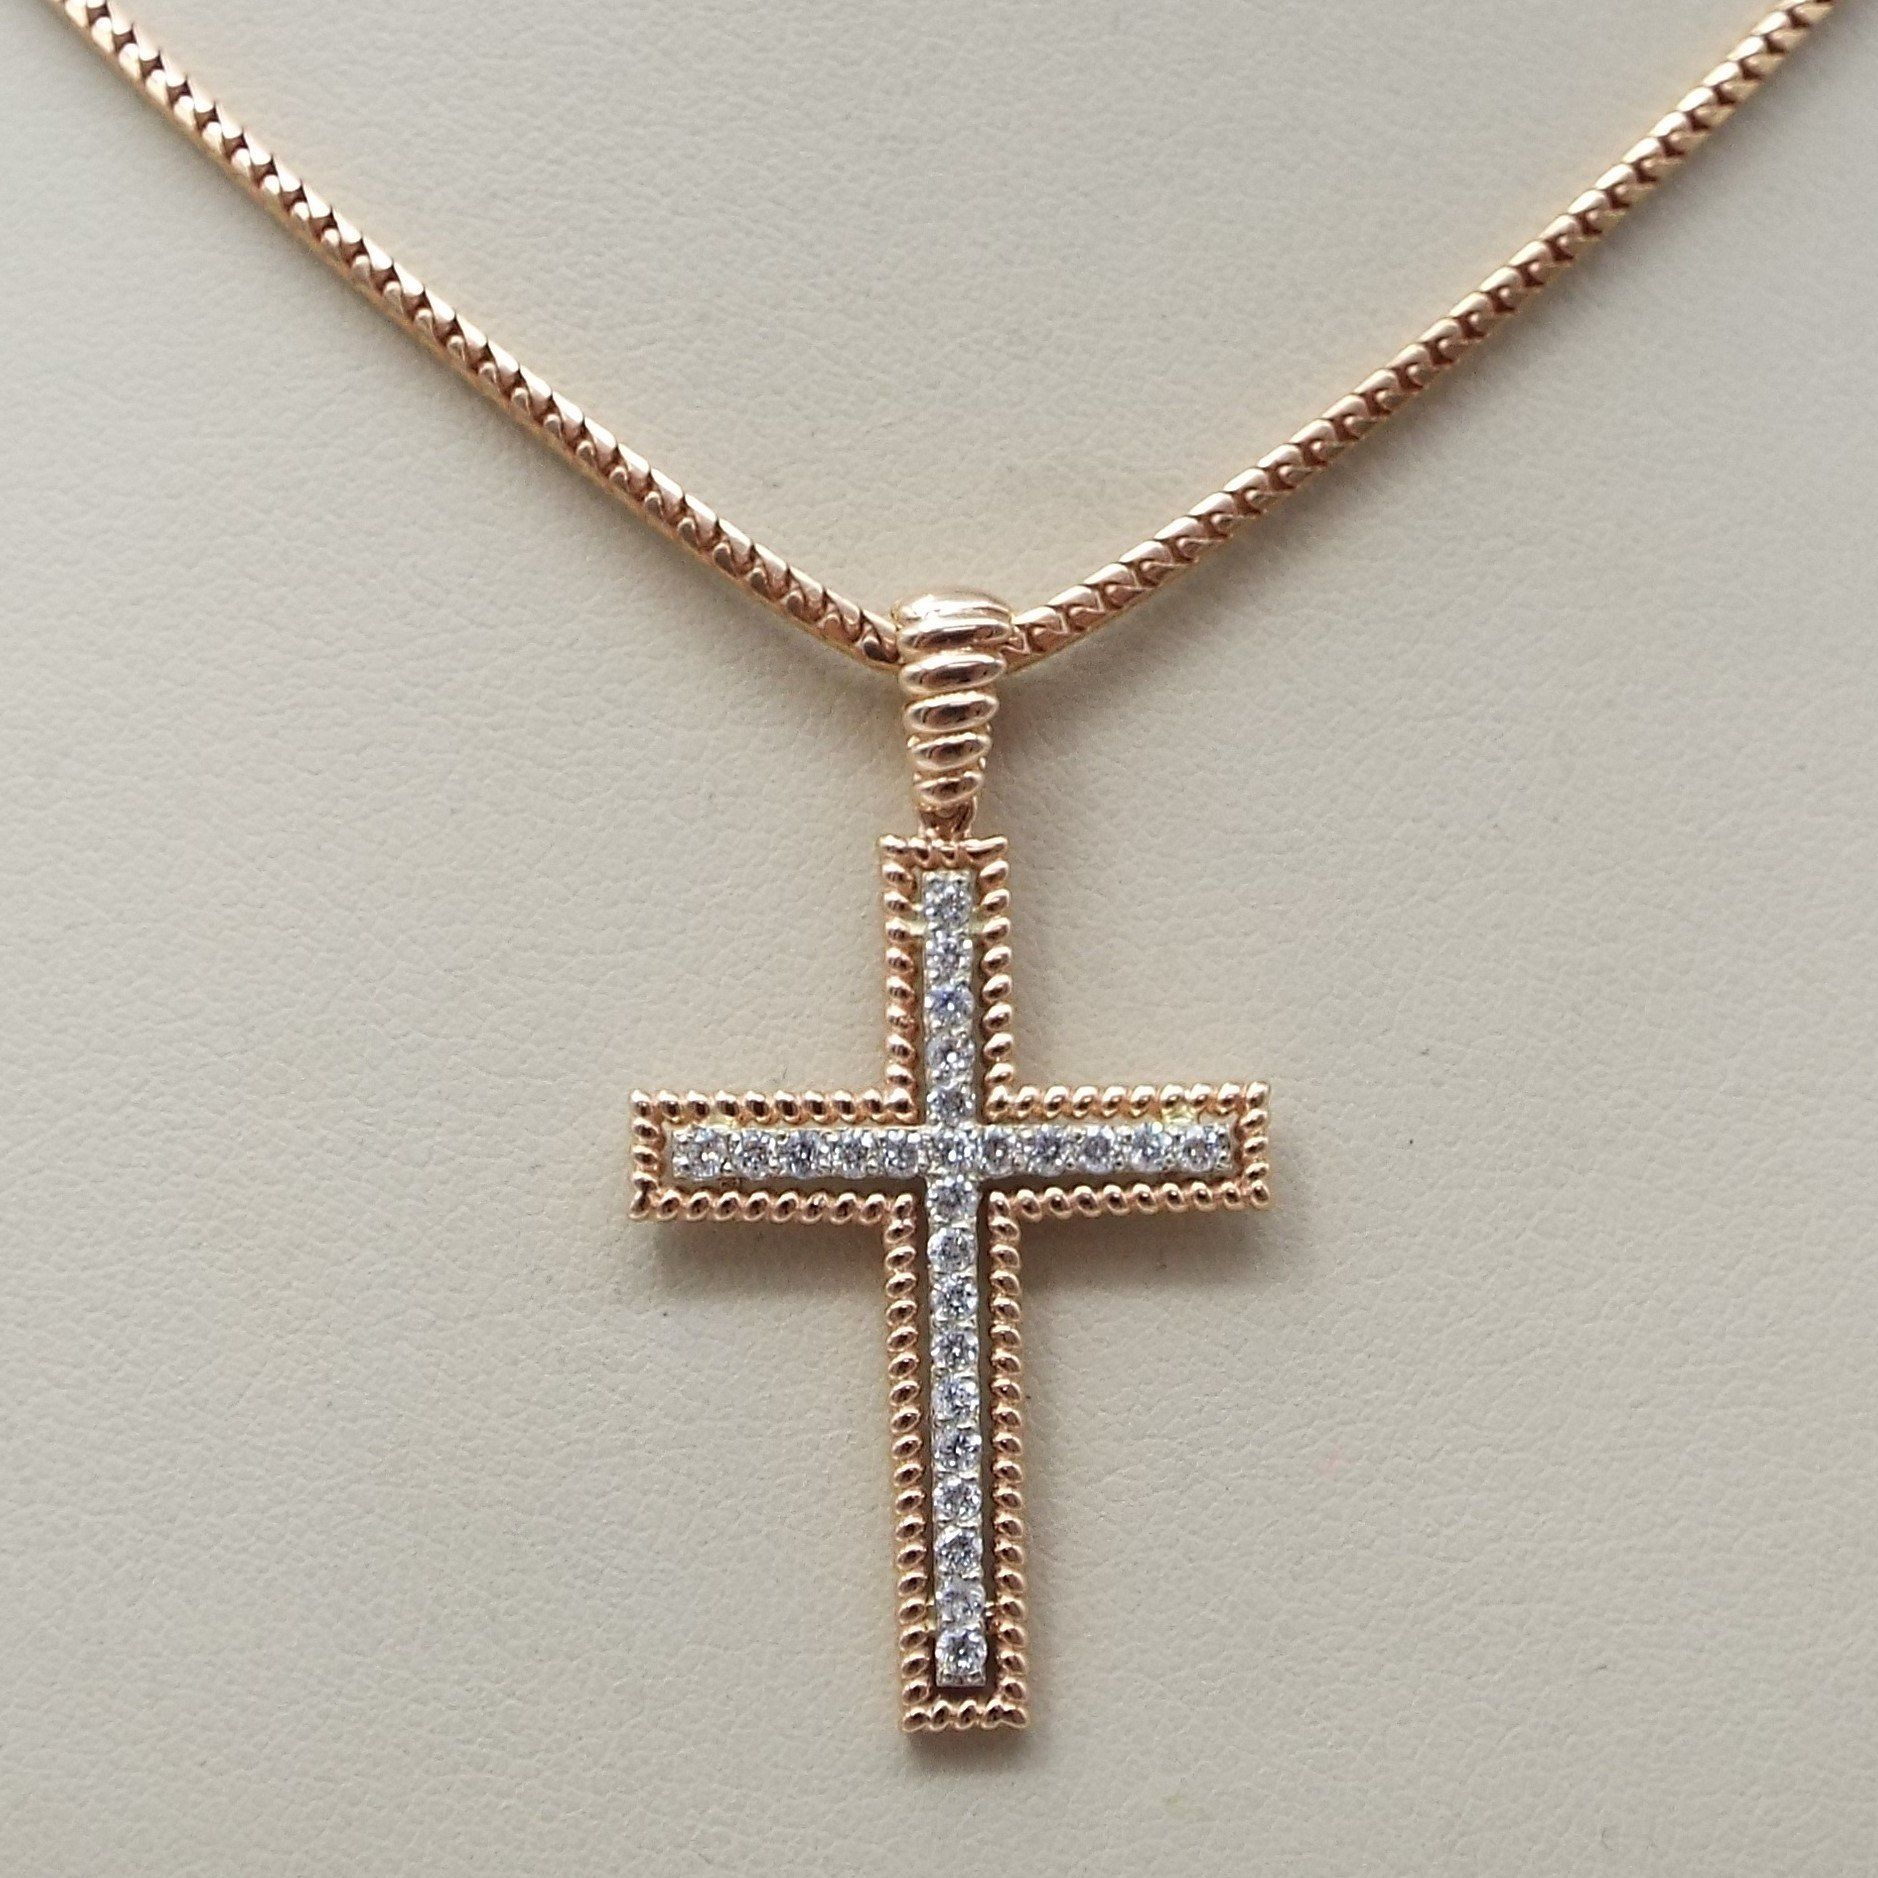 14k Rose Gold Cross Jesus Pendant With Diamonds And Chain Set 0 40 Ct Tdw By Dartamericana On Etsy Gold Cross Gold Pendant